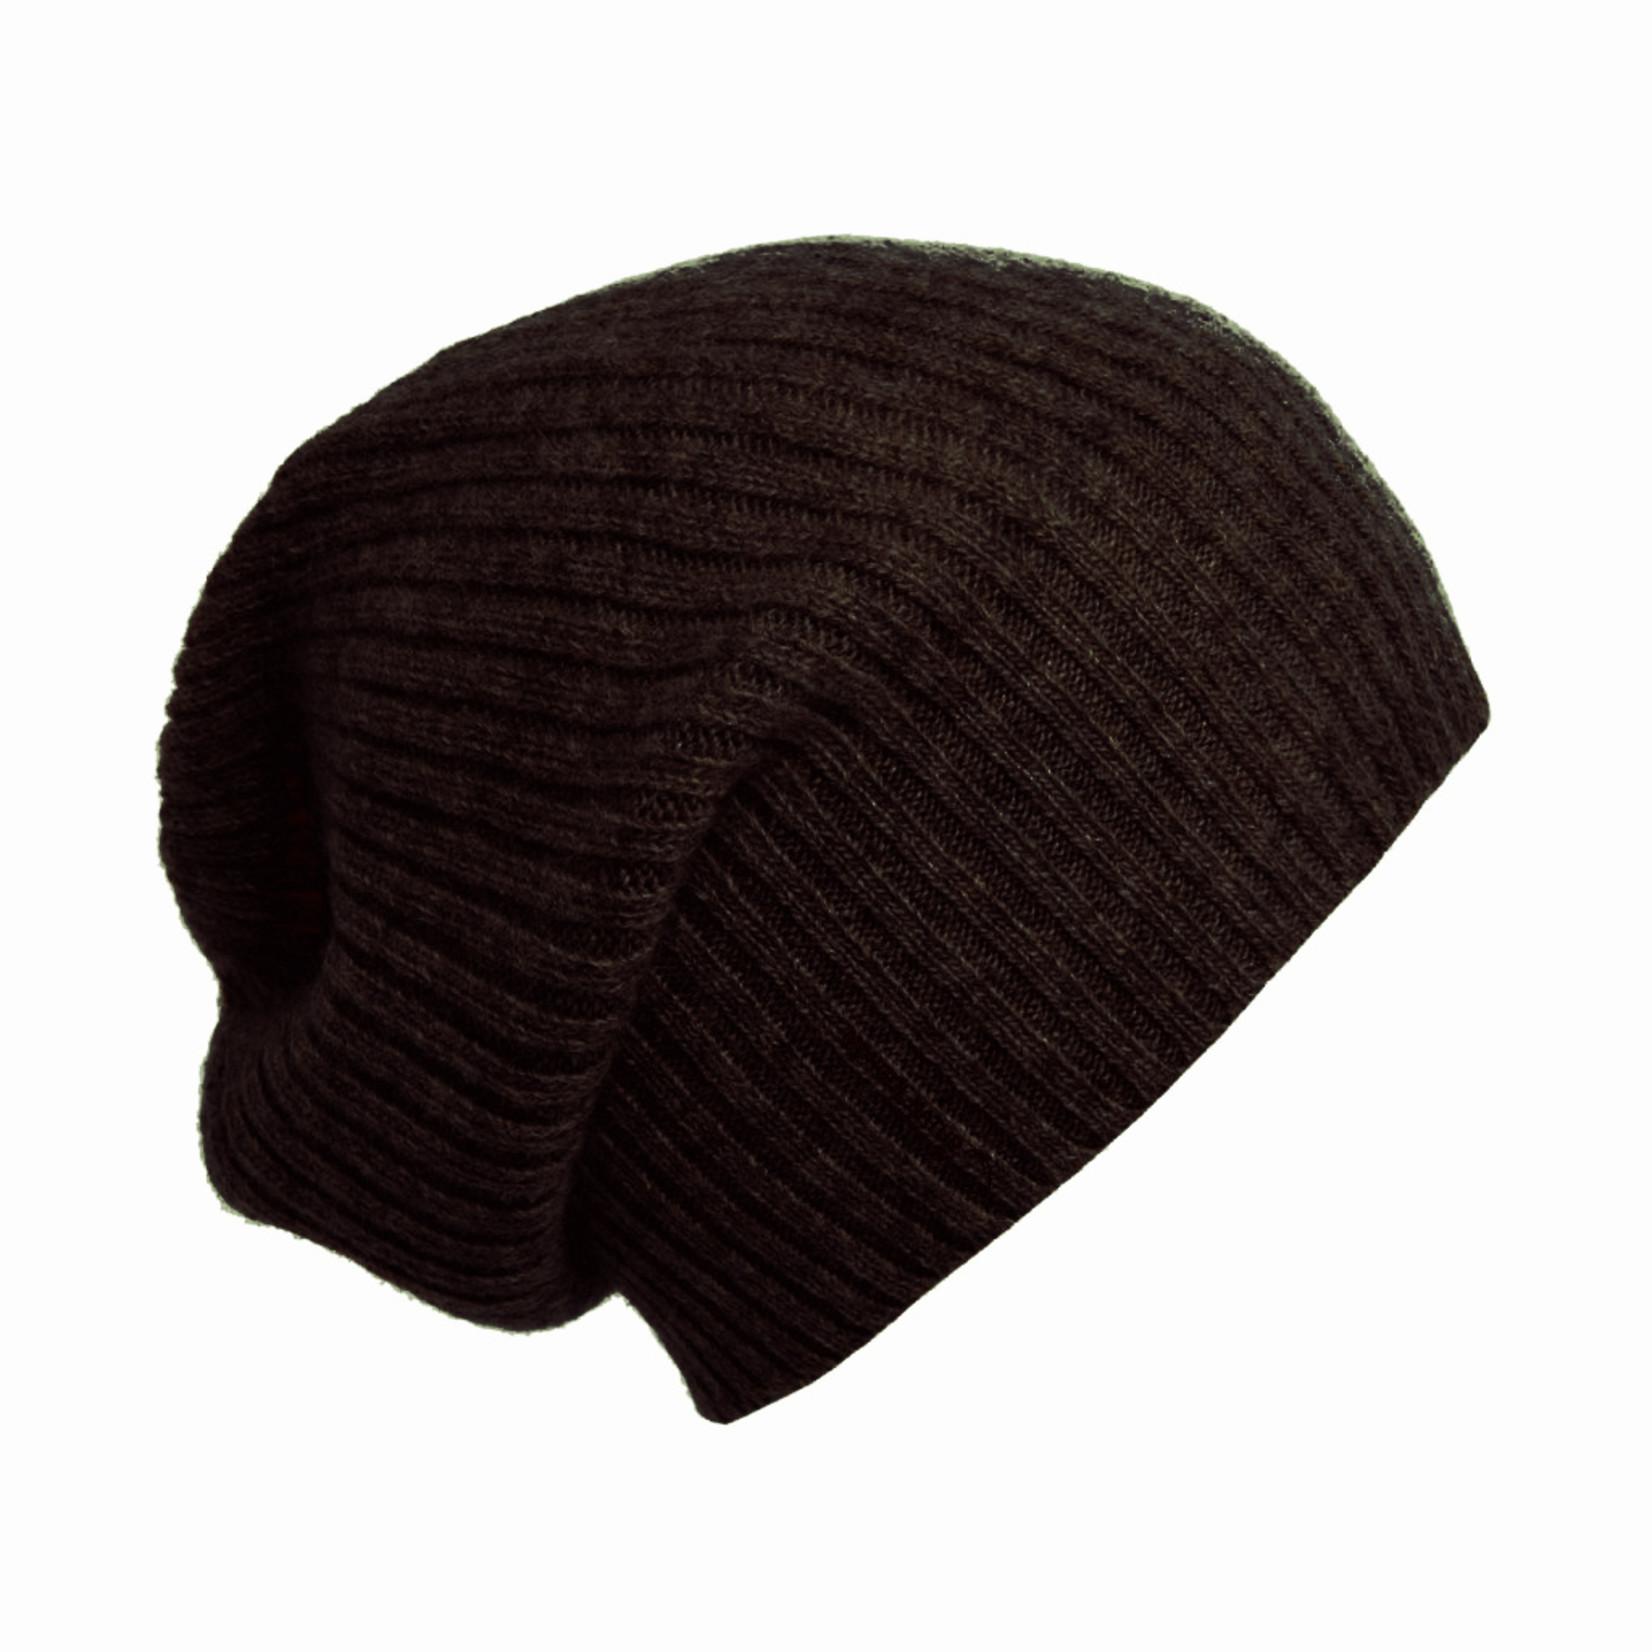 Odgo - Mütze aus Yakwolle  schokobraun